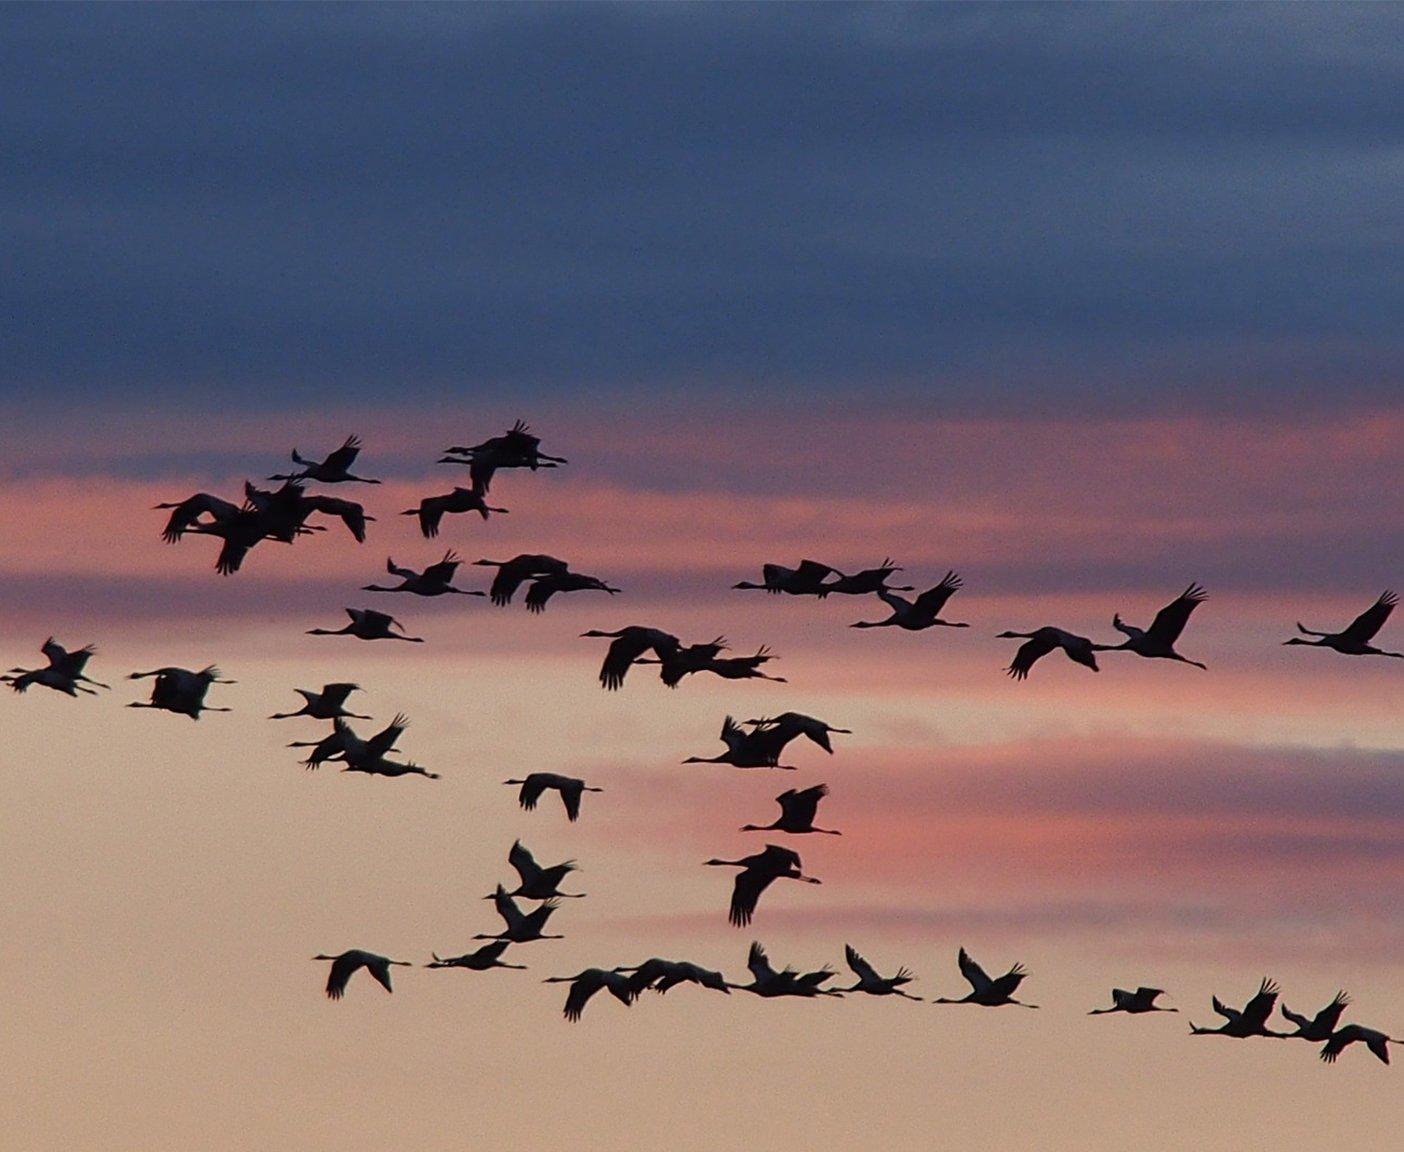 Kraniche, lucht, Zingst, vogels, zwerm